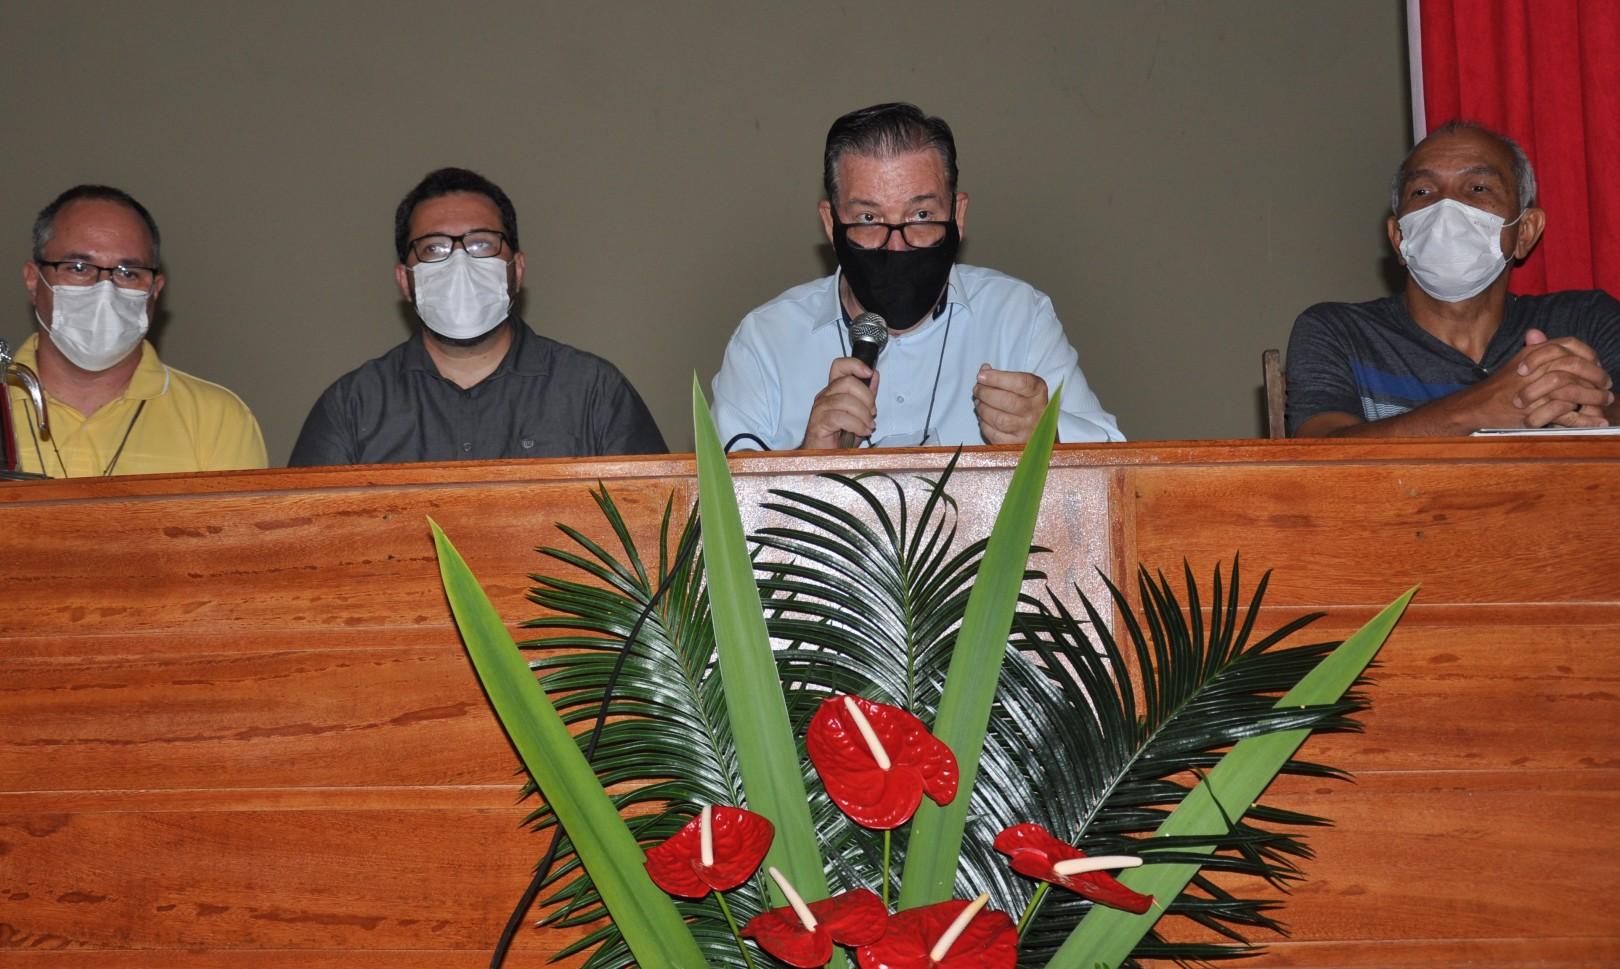 CRD NORDESTE 2, BRASIL,  FAZ ASSEMBLEIA E RECEBE CARTA DO PRESIDENTE DA CND